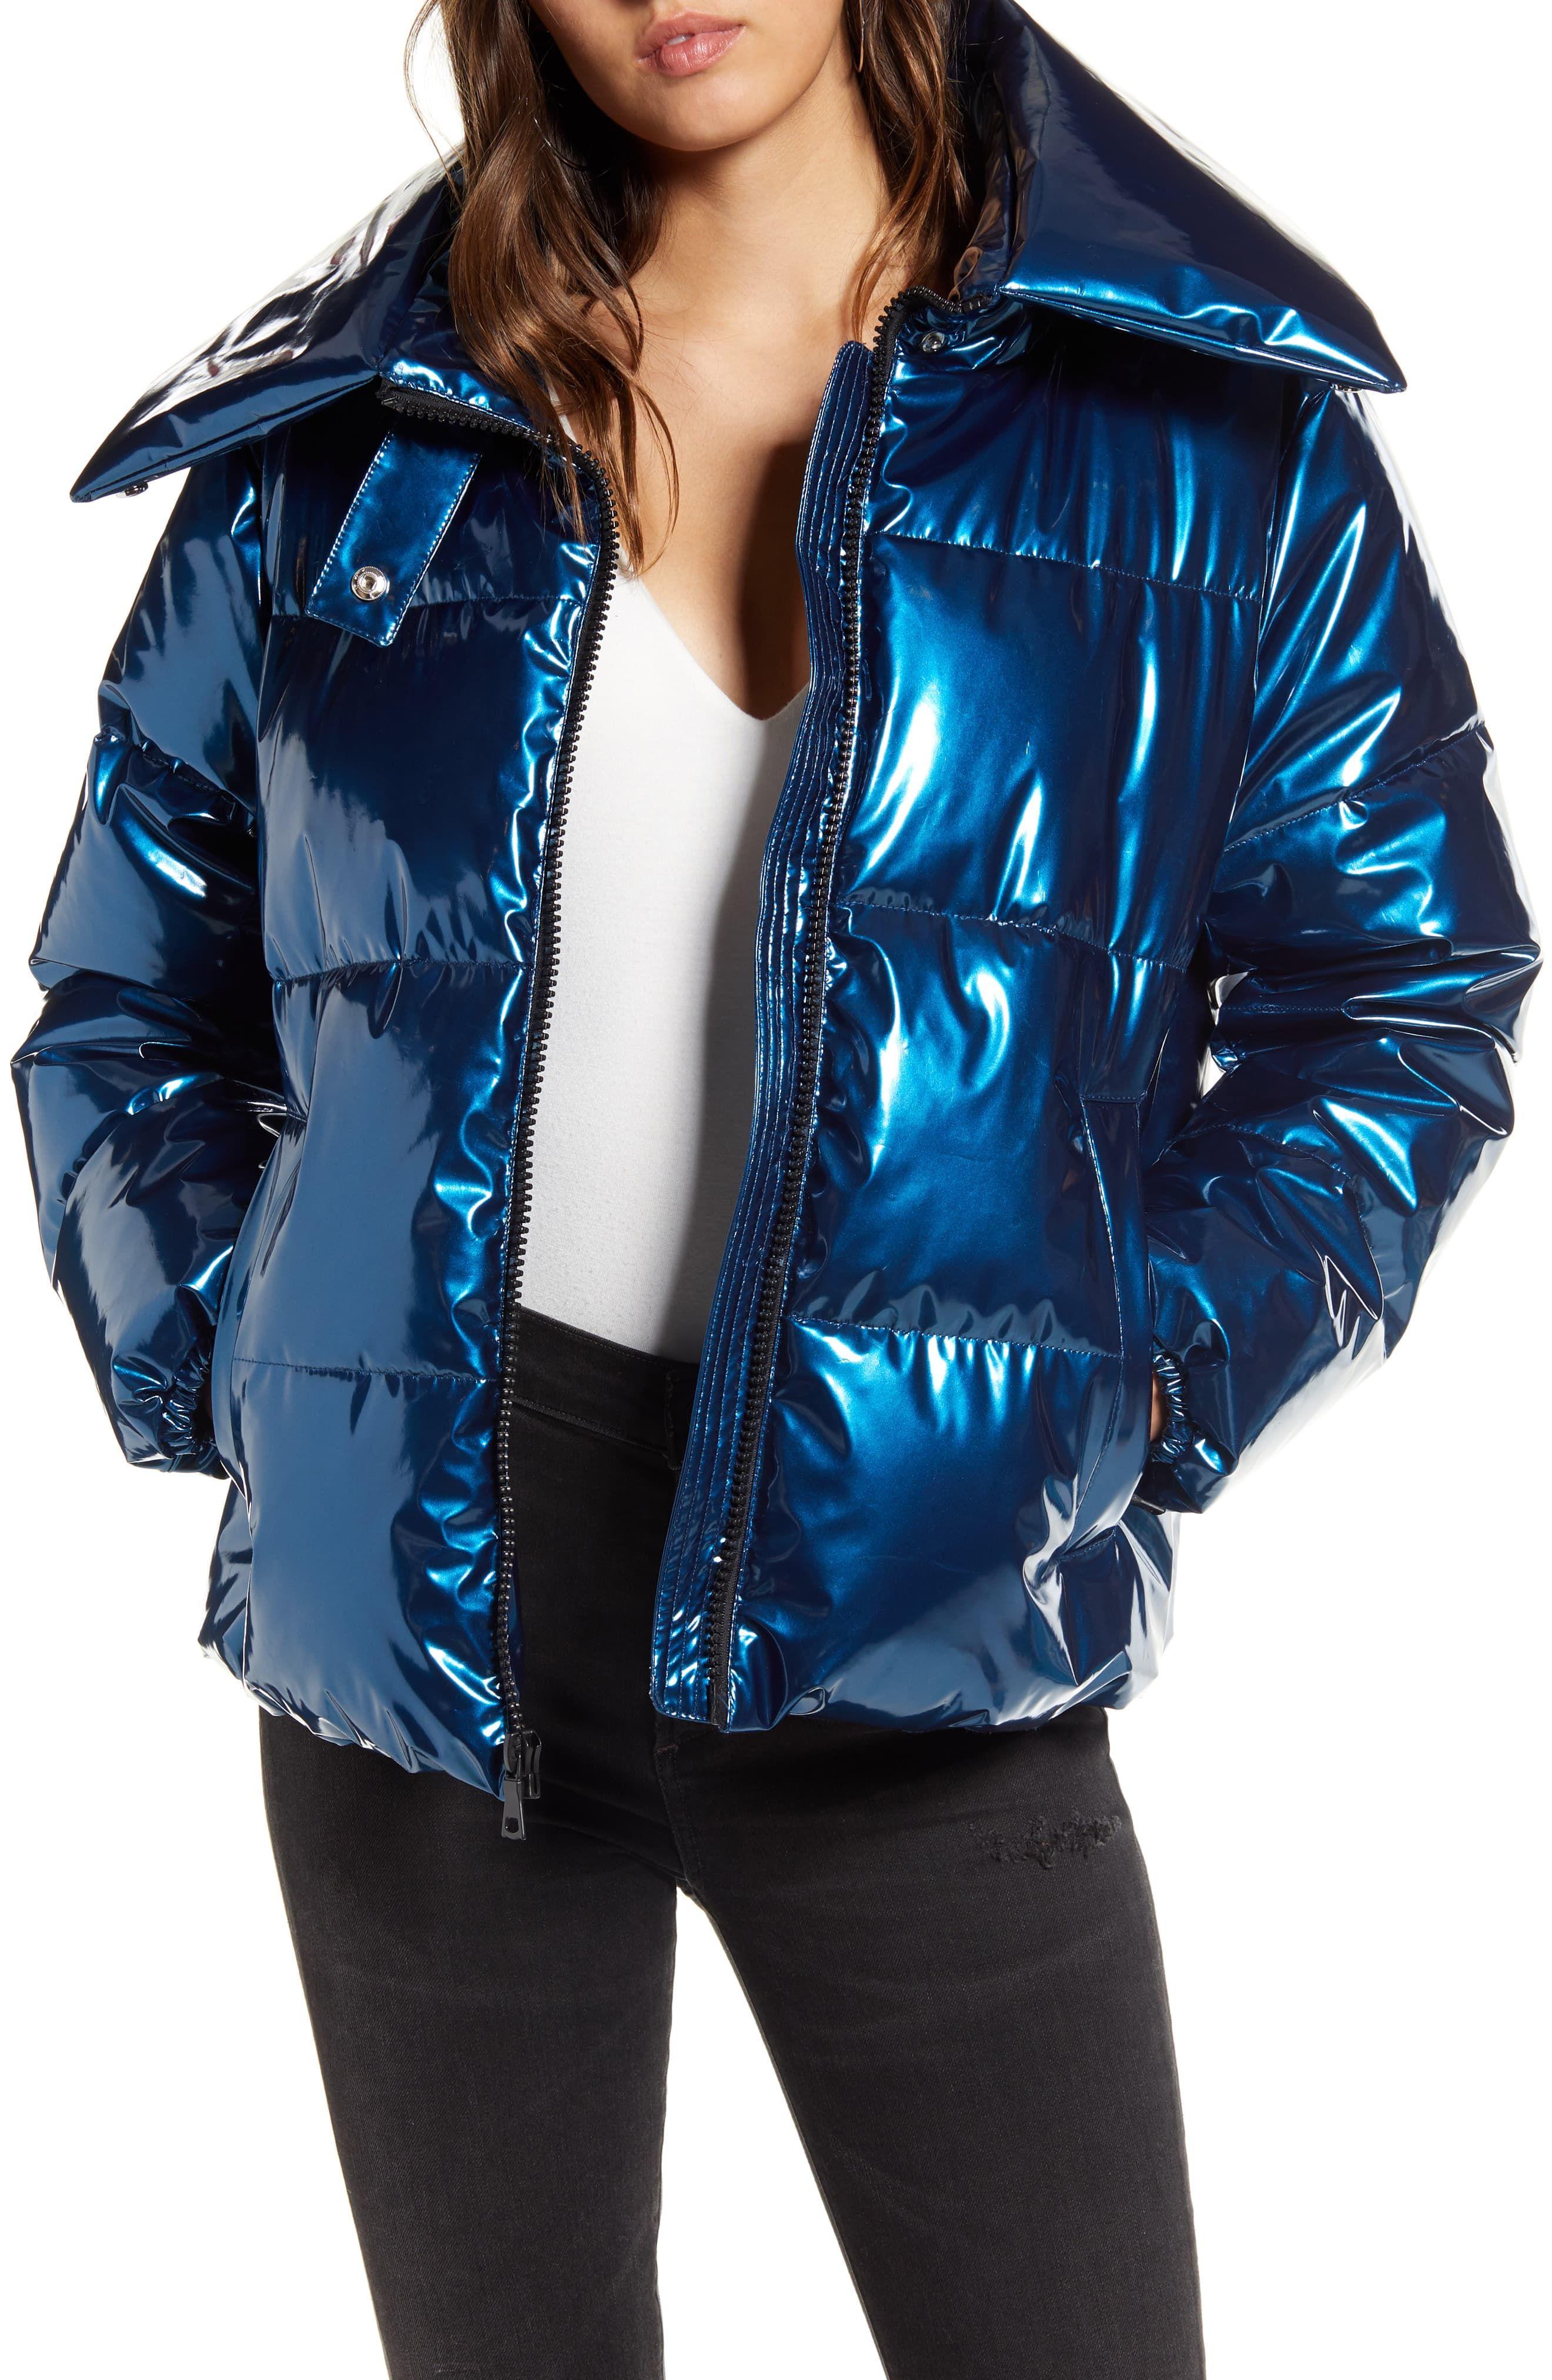 Women S Kendall Kylie Shiny Vinyl Puffer Coat Size Small Blue Puffer Coat Best Winter Coats Long Sleeve Knit Tops